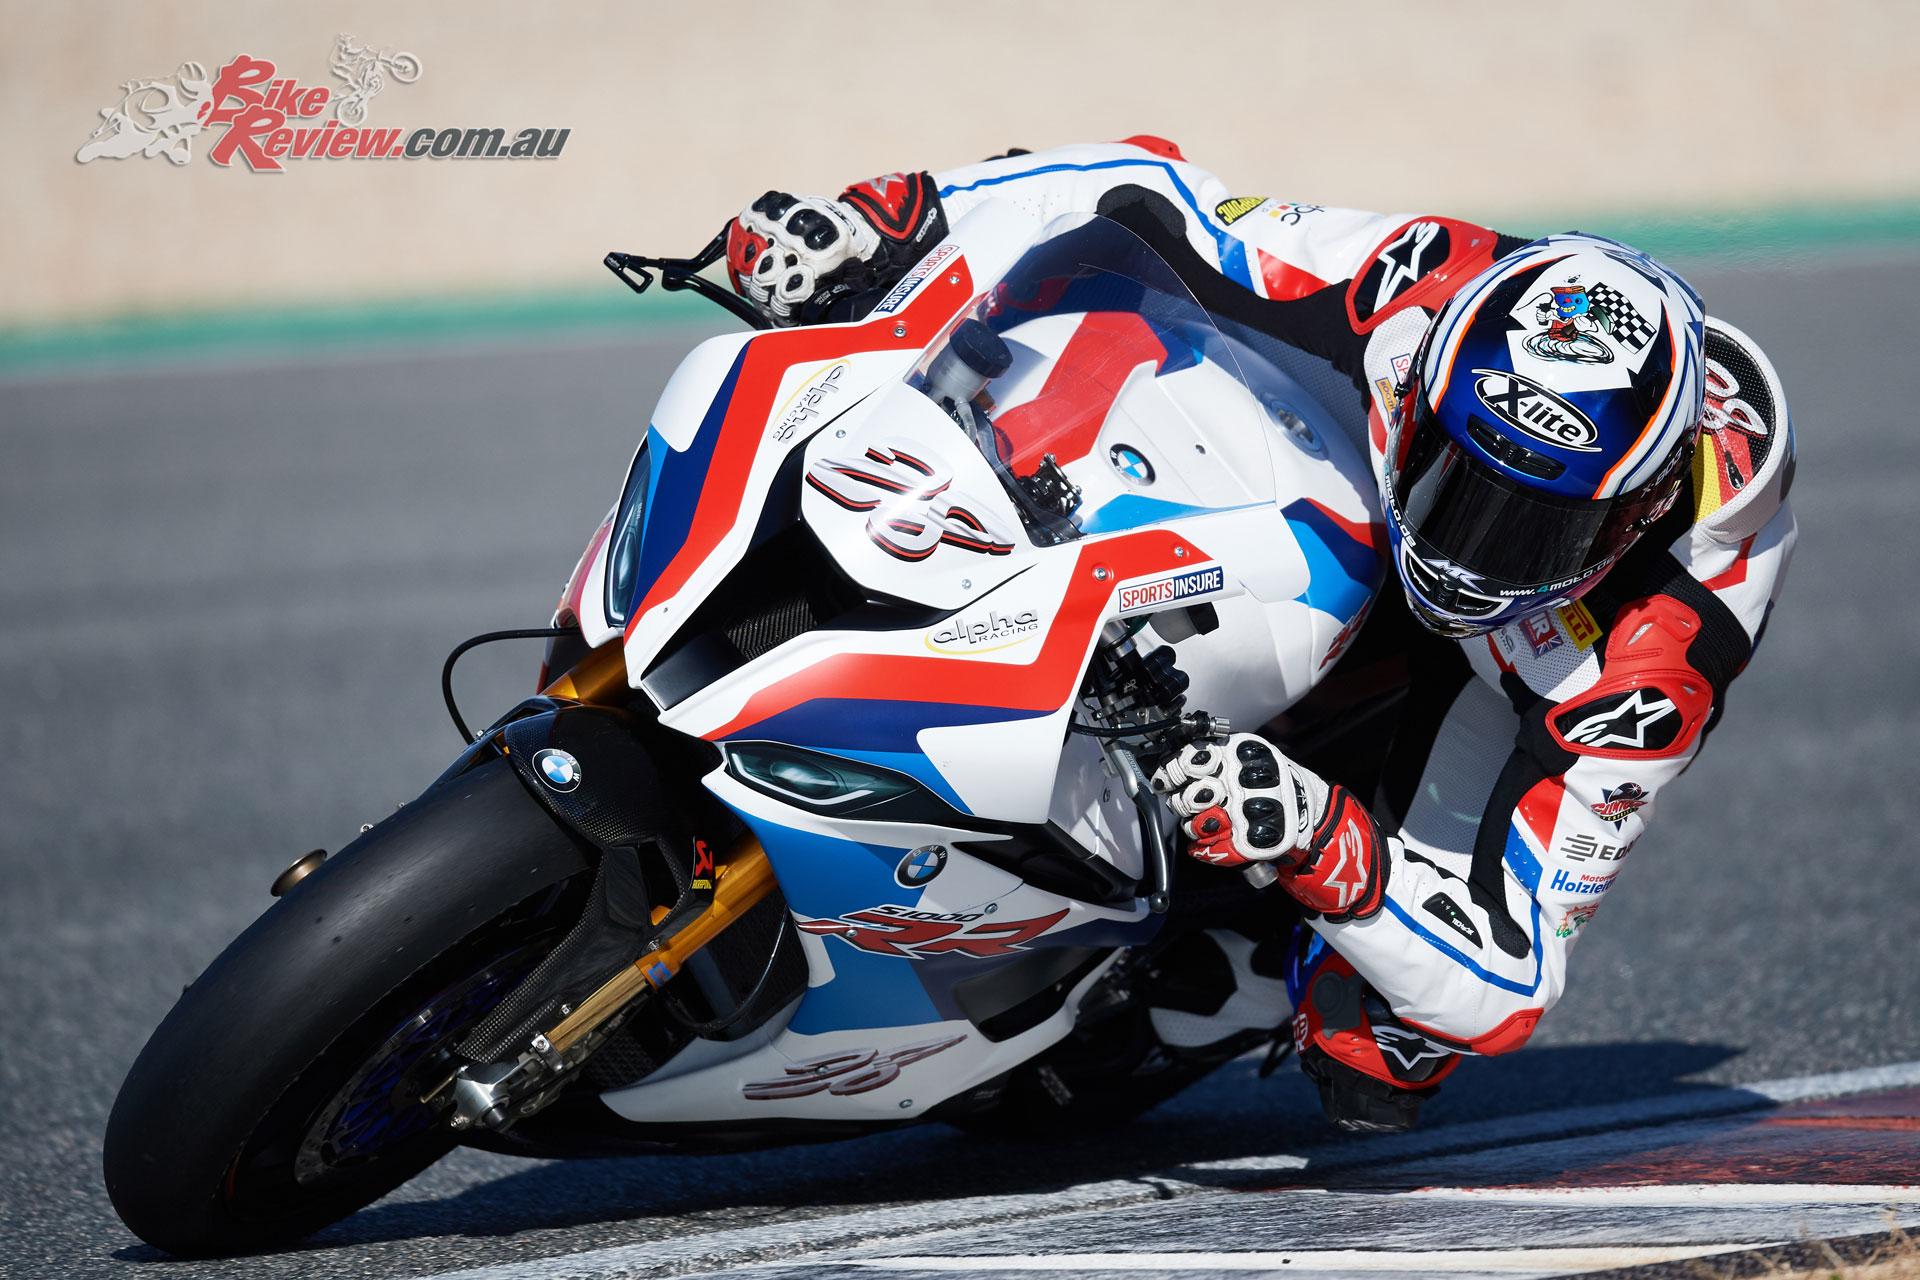 2019 BMW Motorrad WorldSBK Team livery revealed